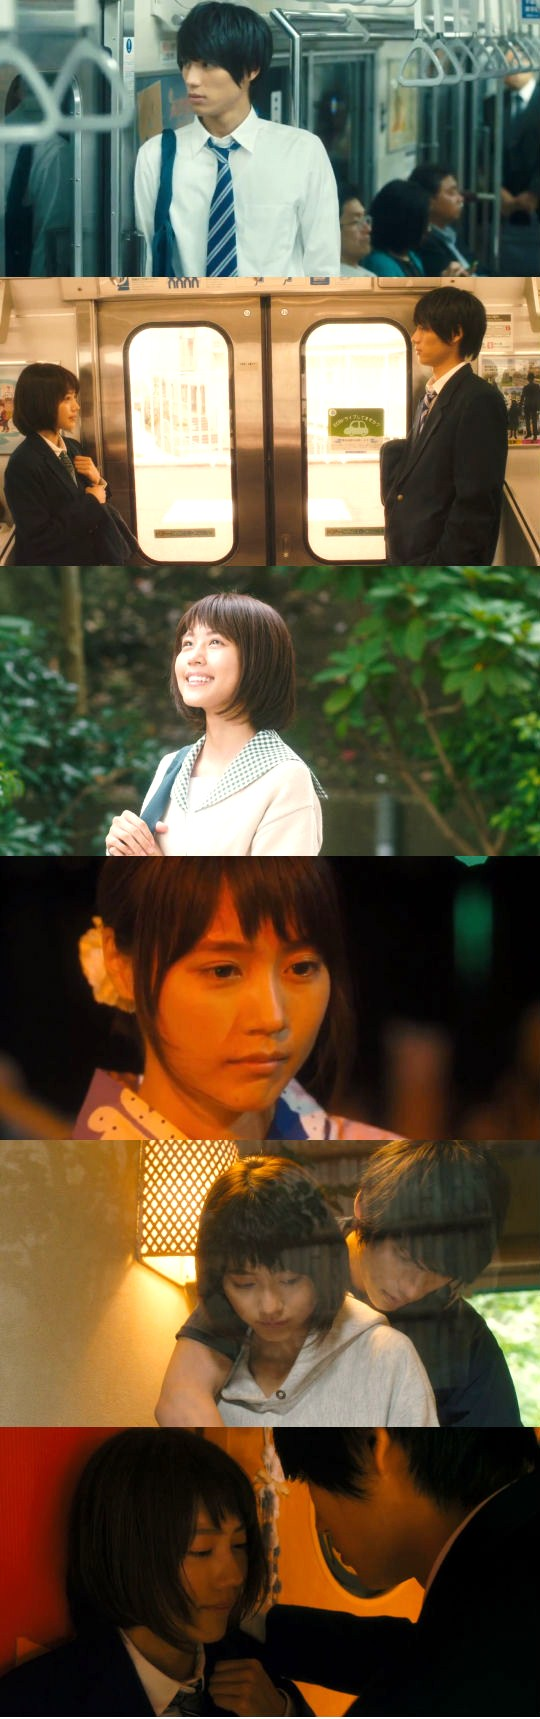 "Sota Fukushi x Kasumi Arimura, J LA movie ""Strobe Edge"". [clip"